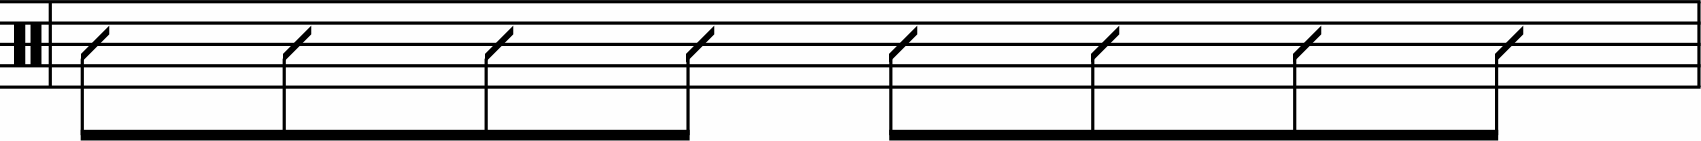 Eighth-note rhythm example.